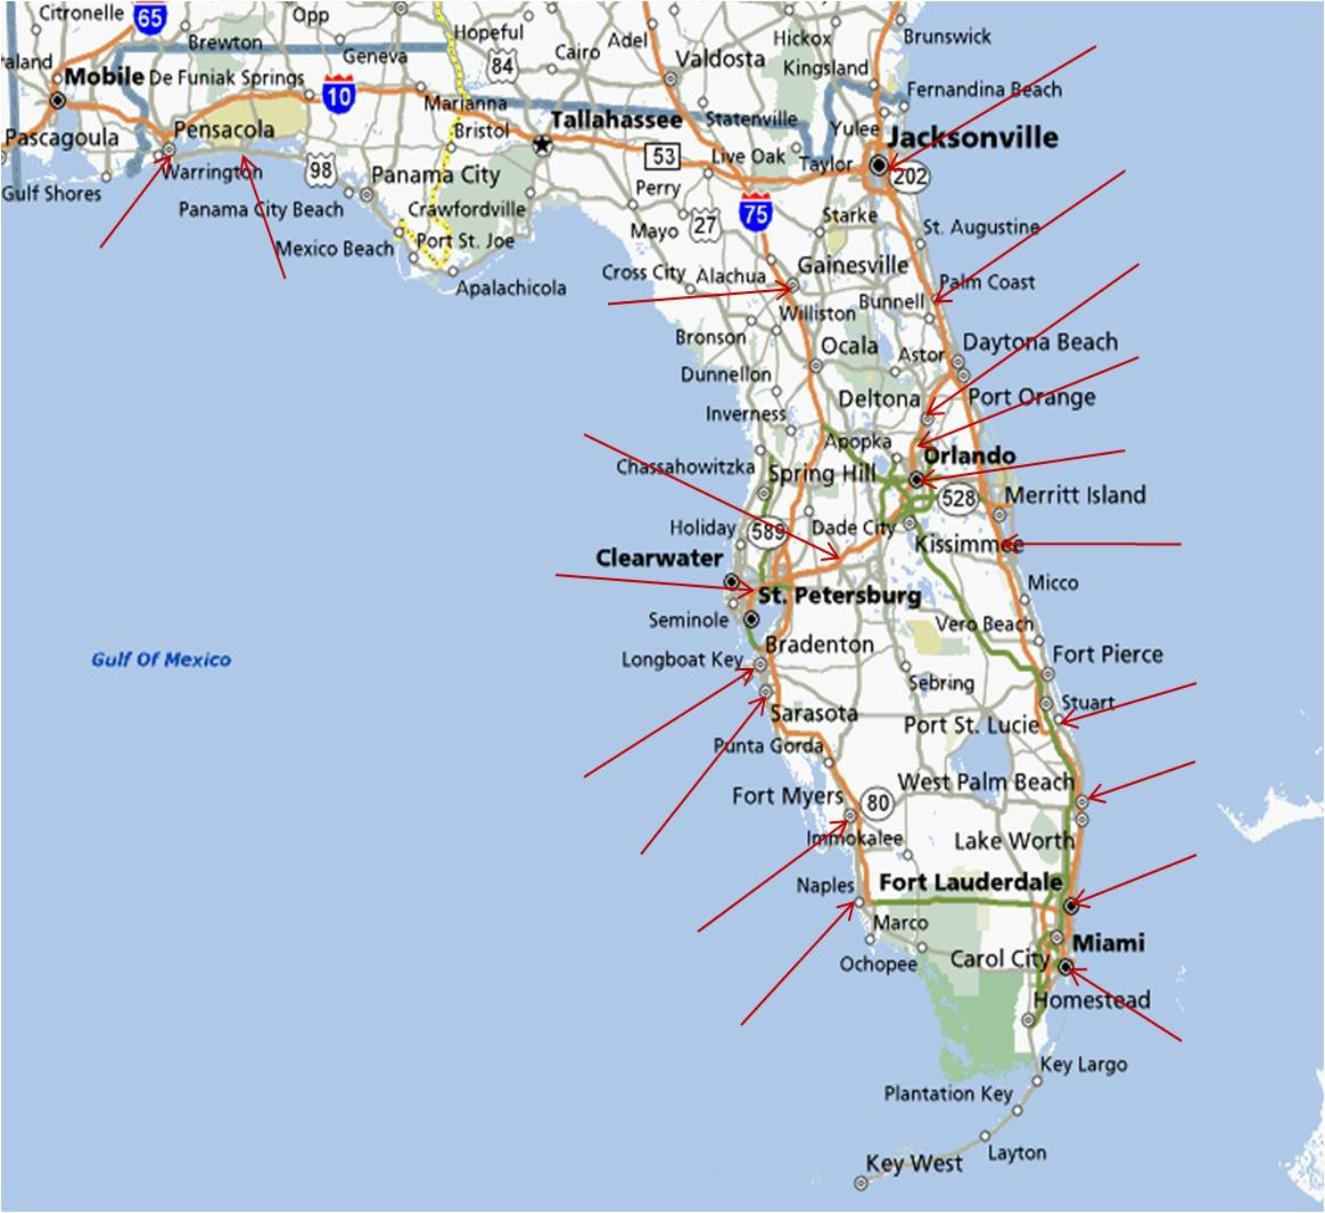 Map Of Florida Running Stores - Rosemary Florida Map